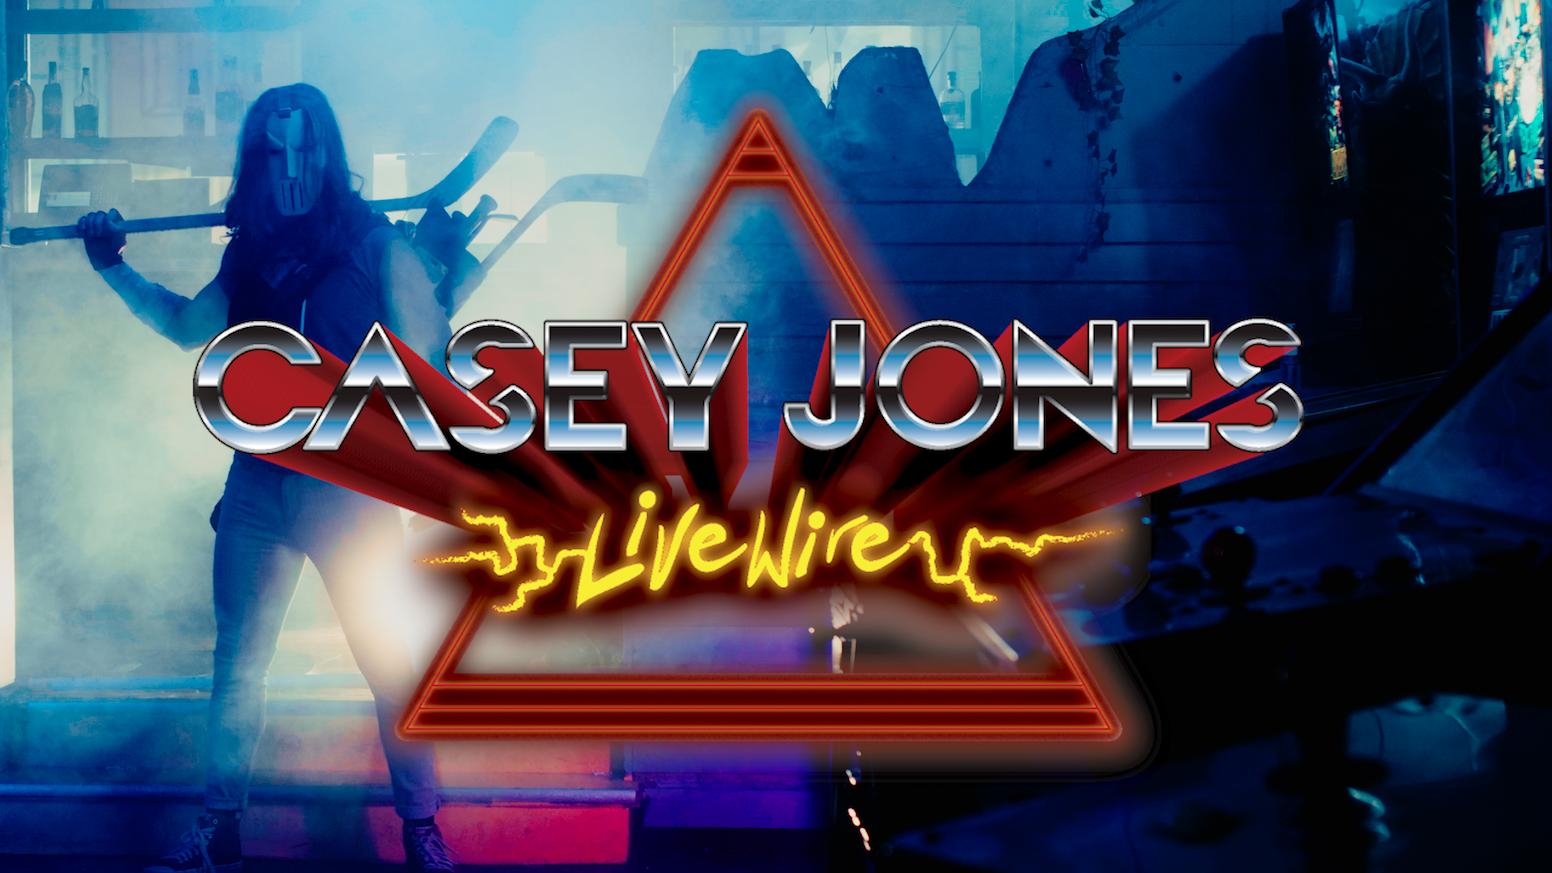 A radical short fan film starring everyone's favorite hockey-masked vigilante, Casey Jones!